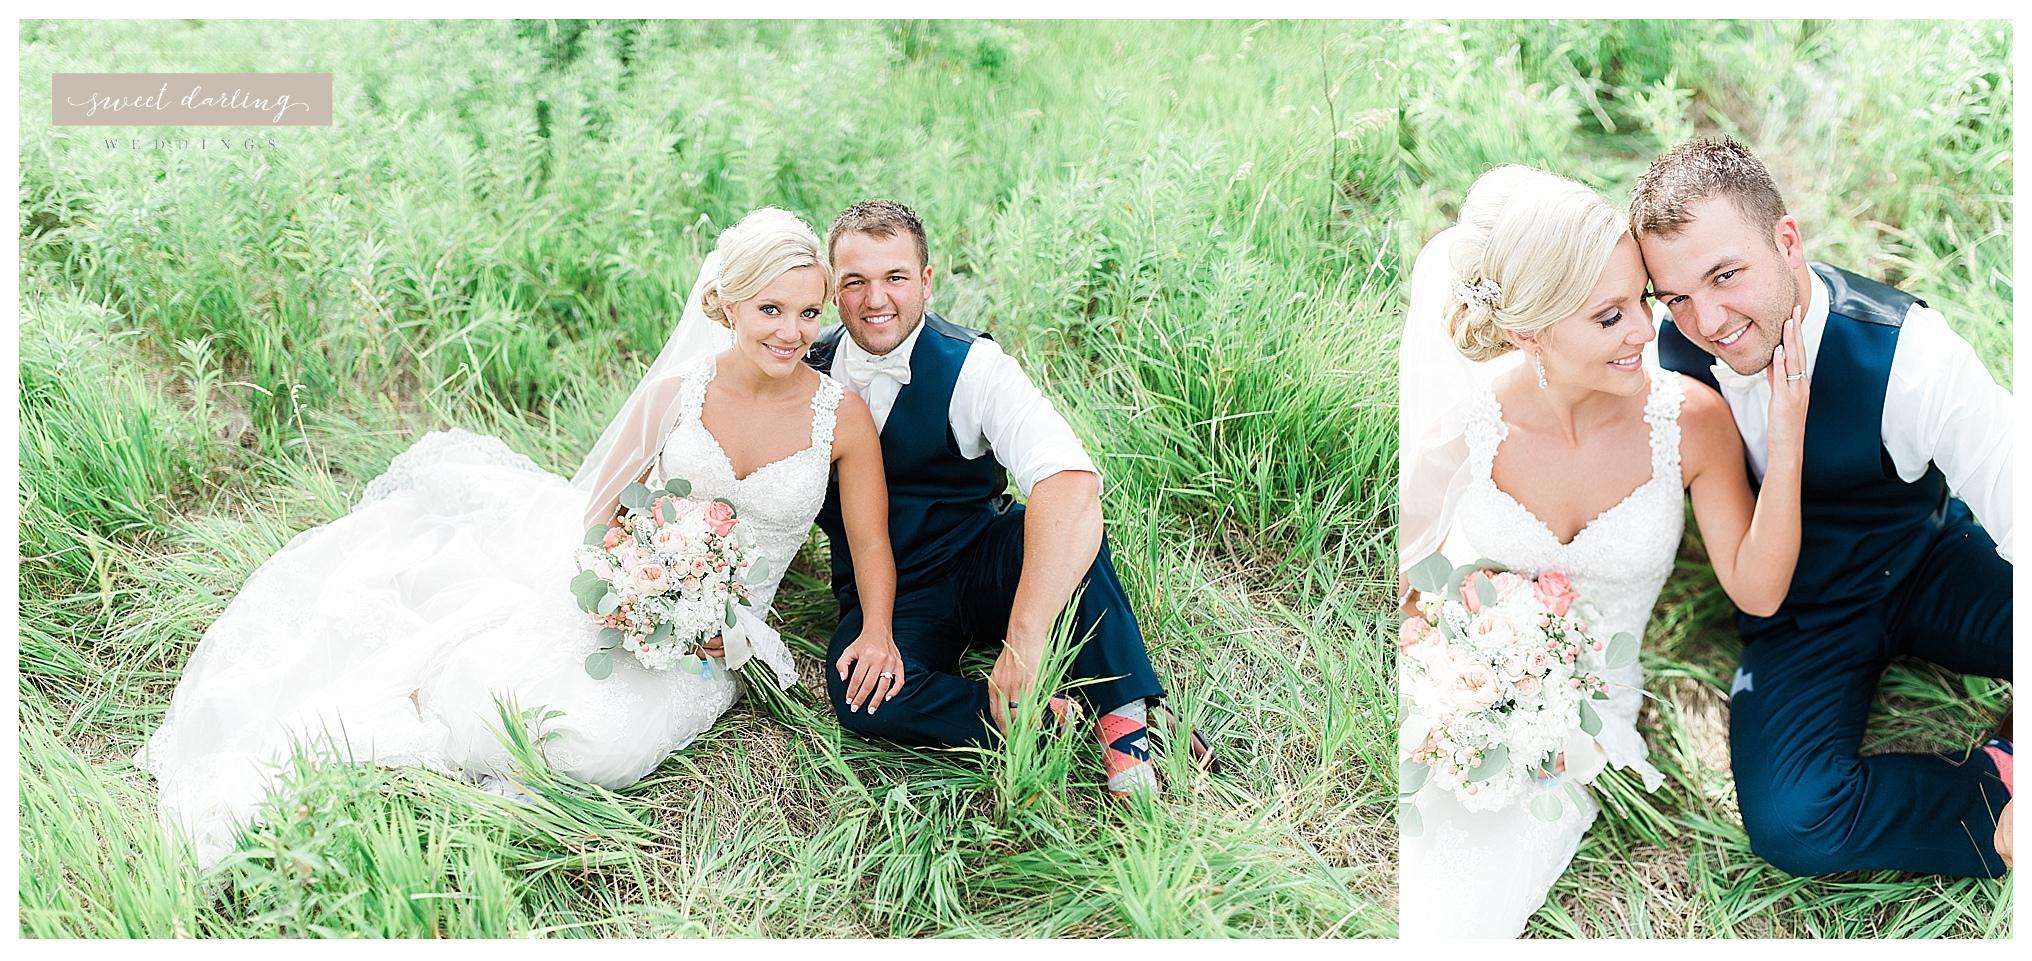 Paxton-illinois-engelbrecht-farmstead-romantic-wedding-photographer-sweet-darling-weddings_1240.jpg